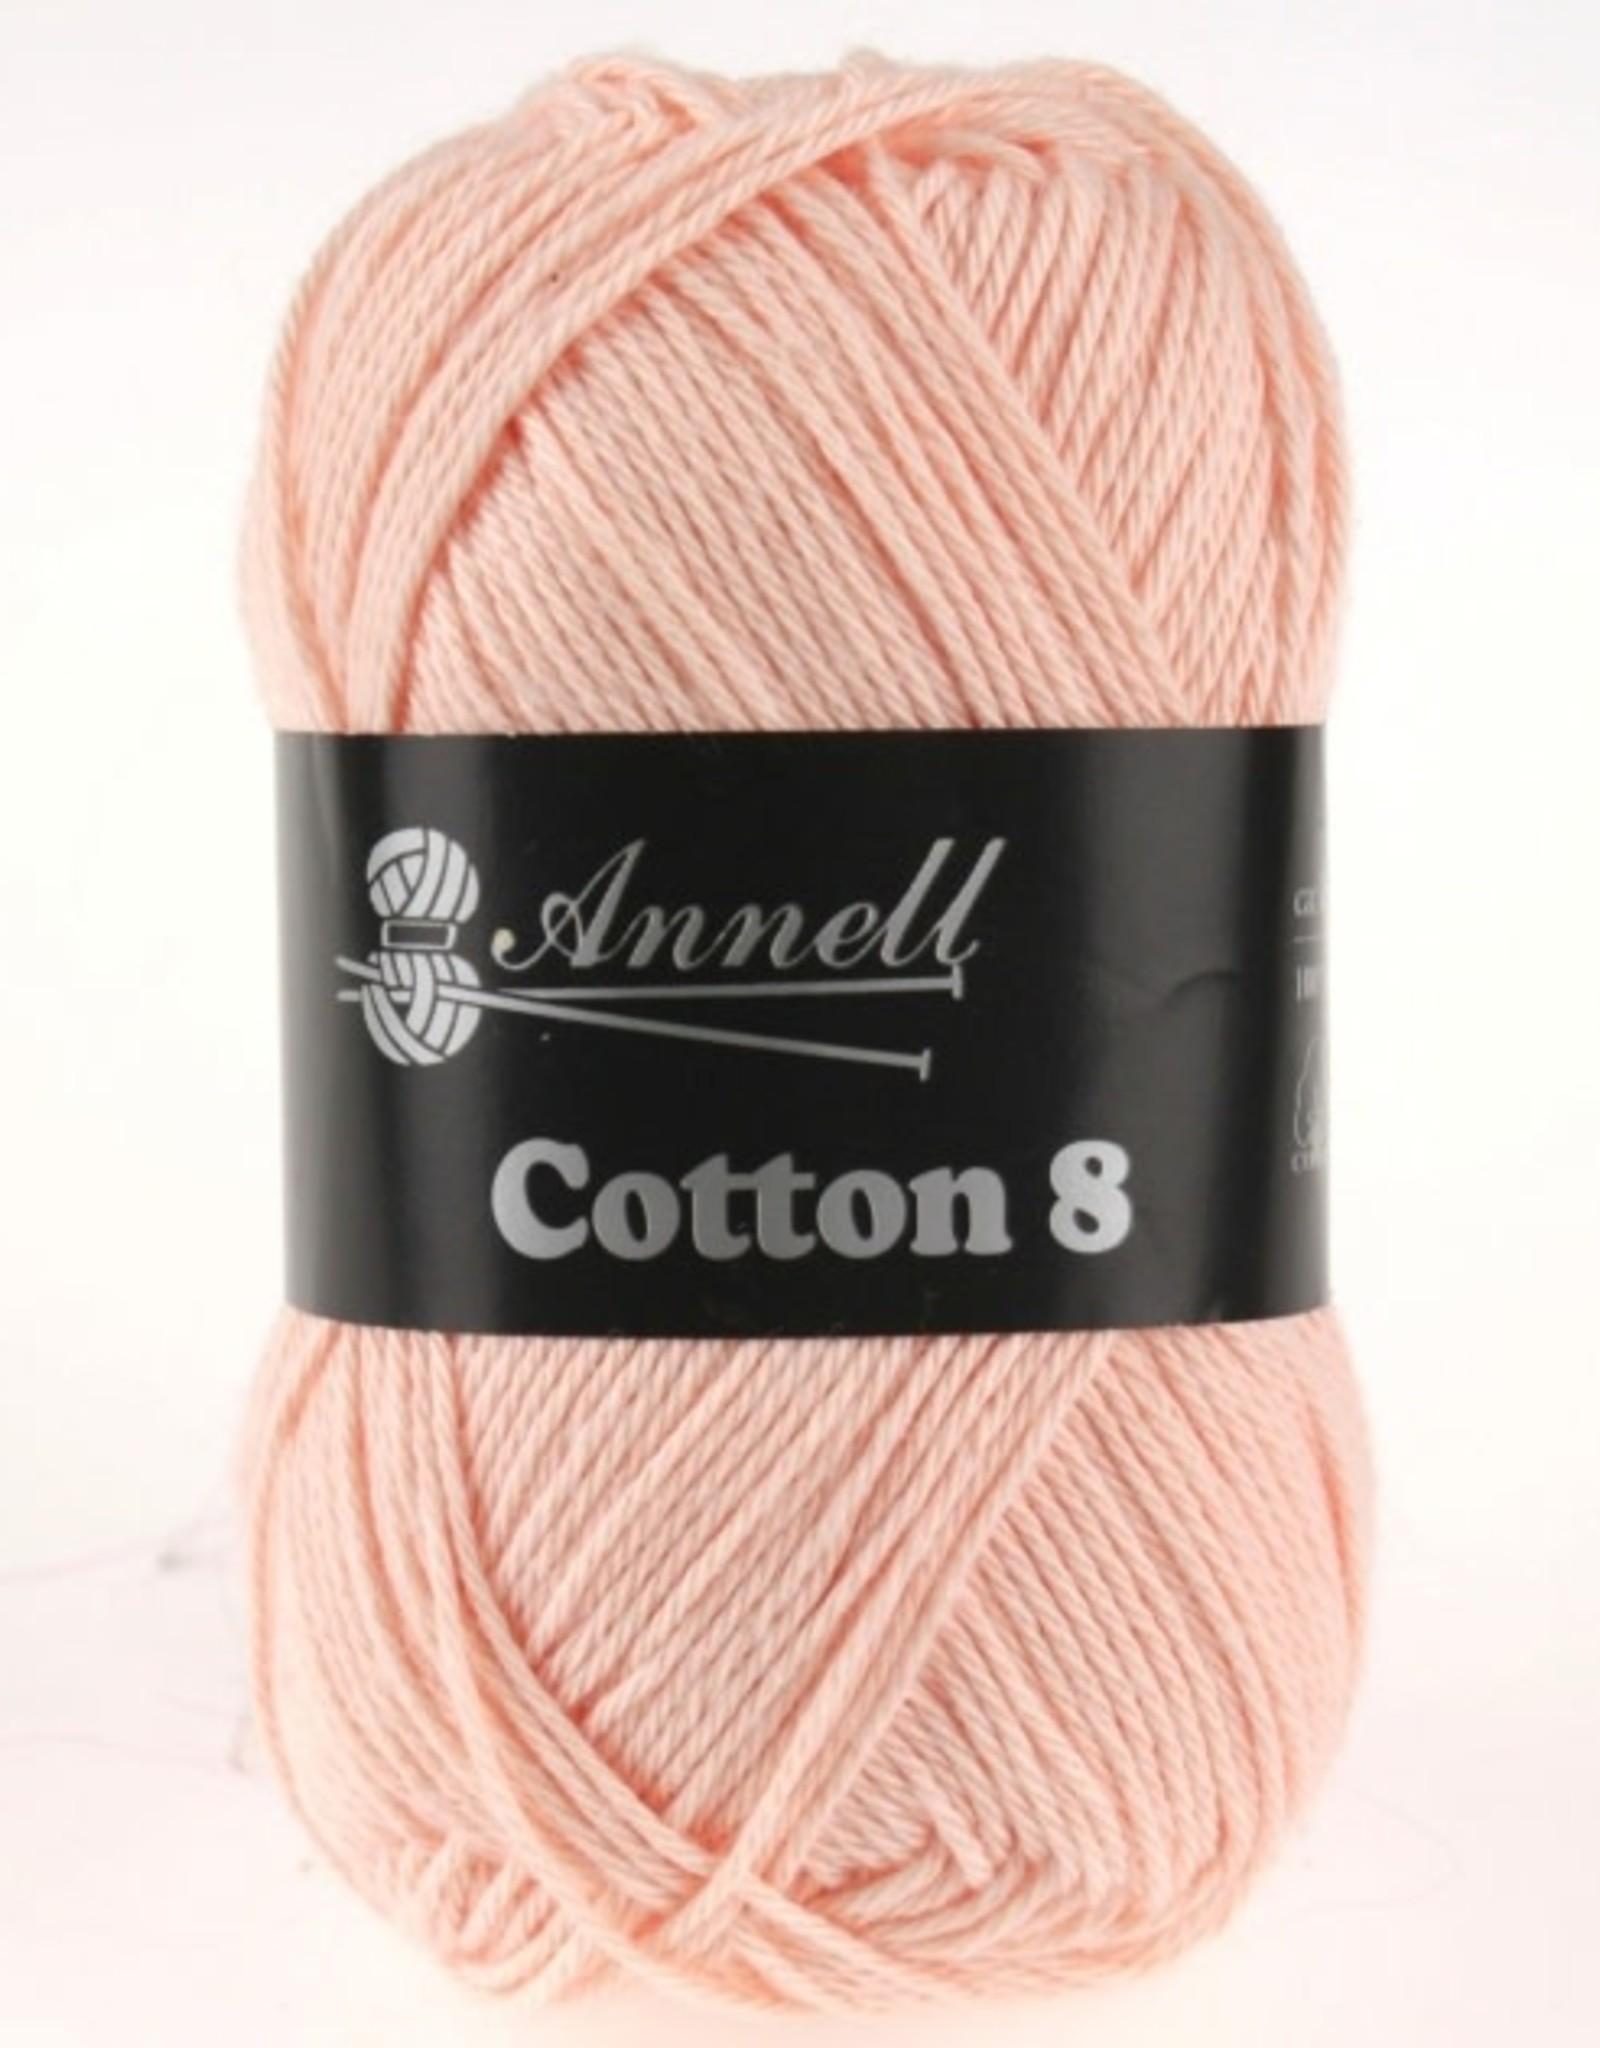 Annell Annell Cotton 8 16